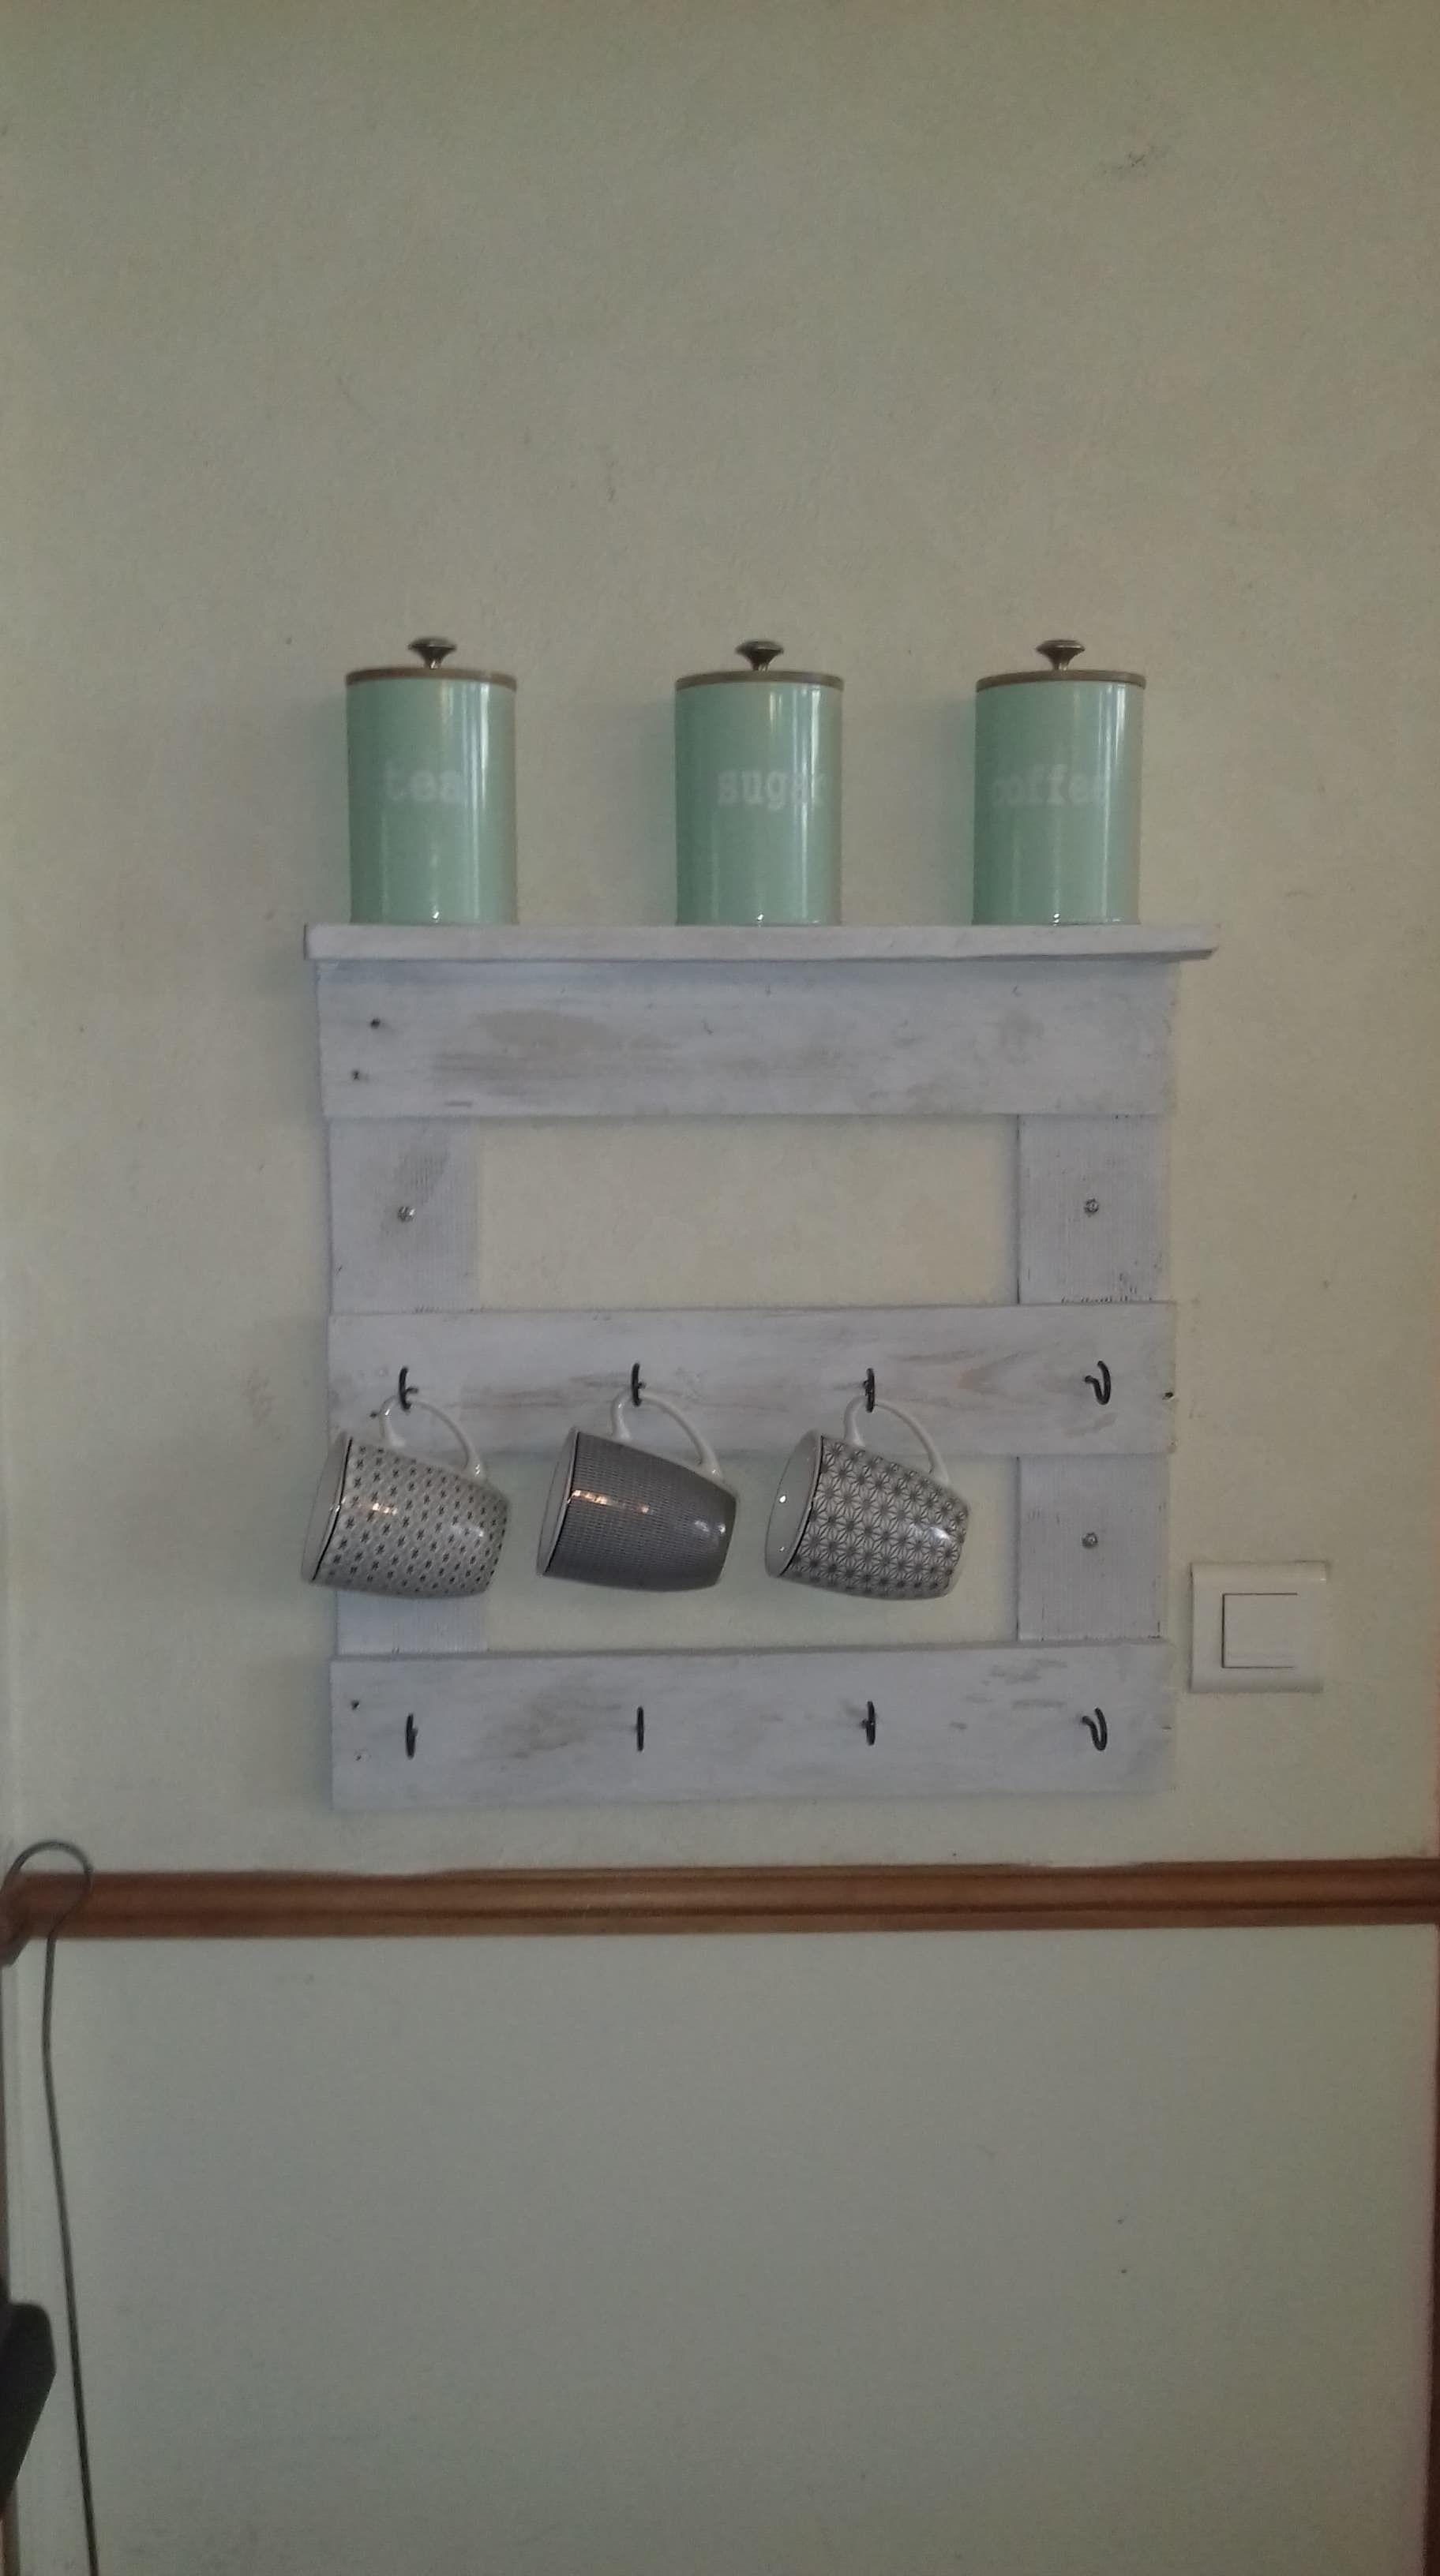 Wooden mug rack